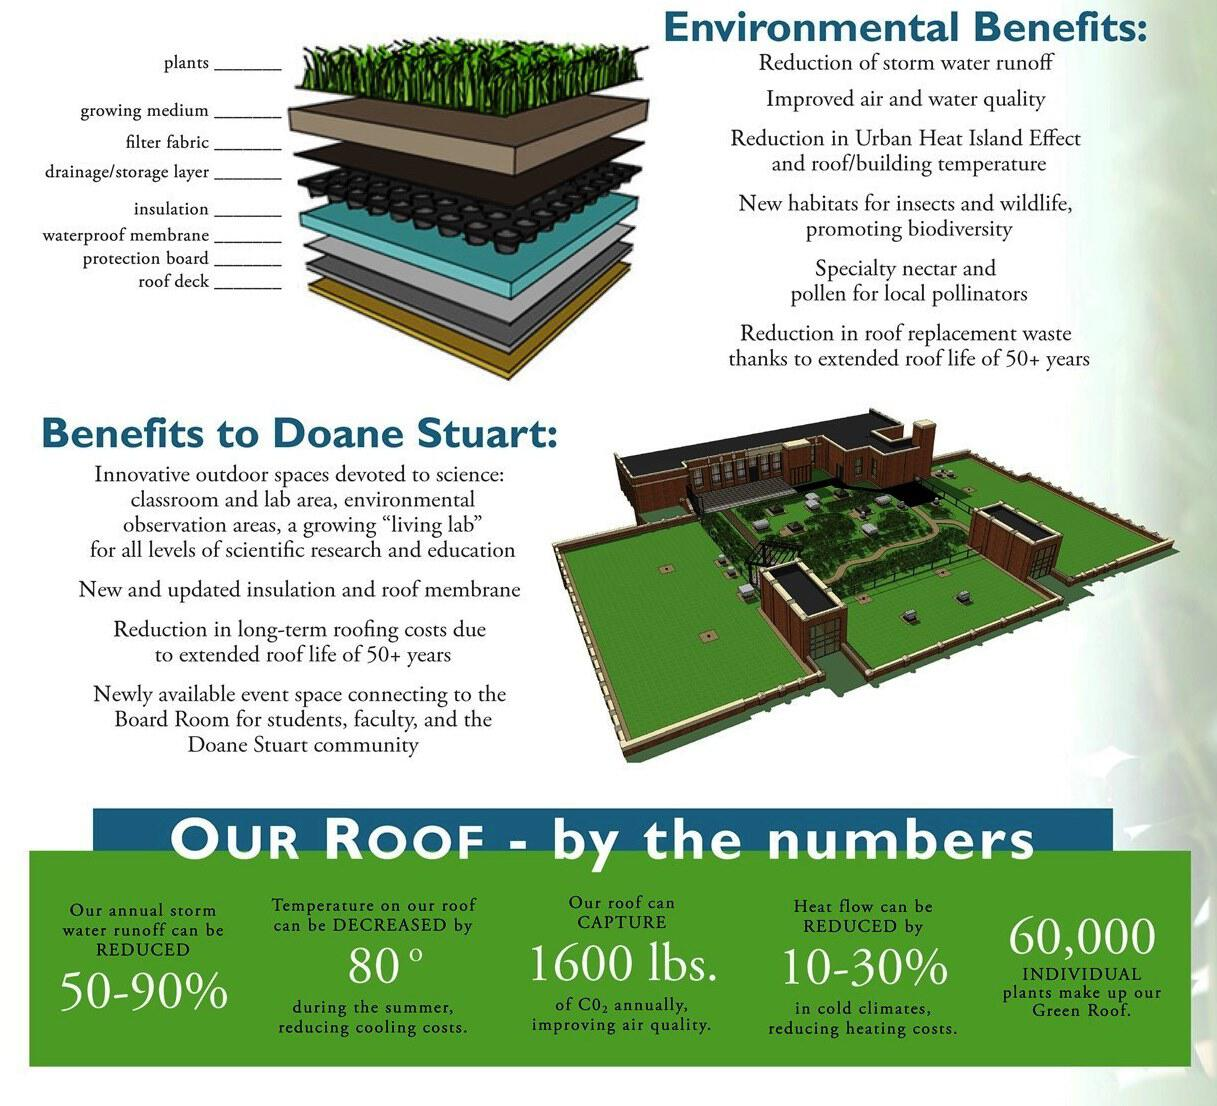 Benefits. Eco Education for All Students   Doane Stuart